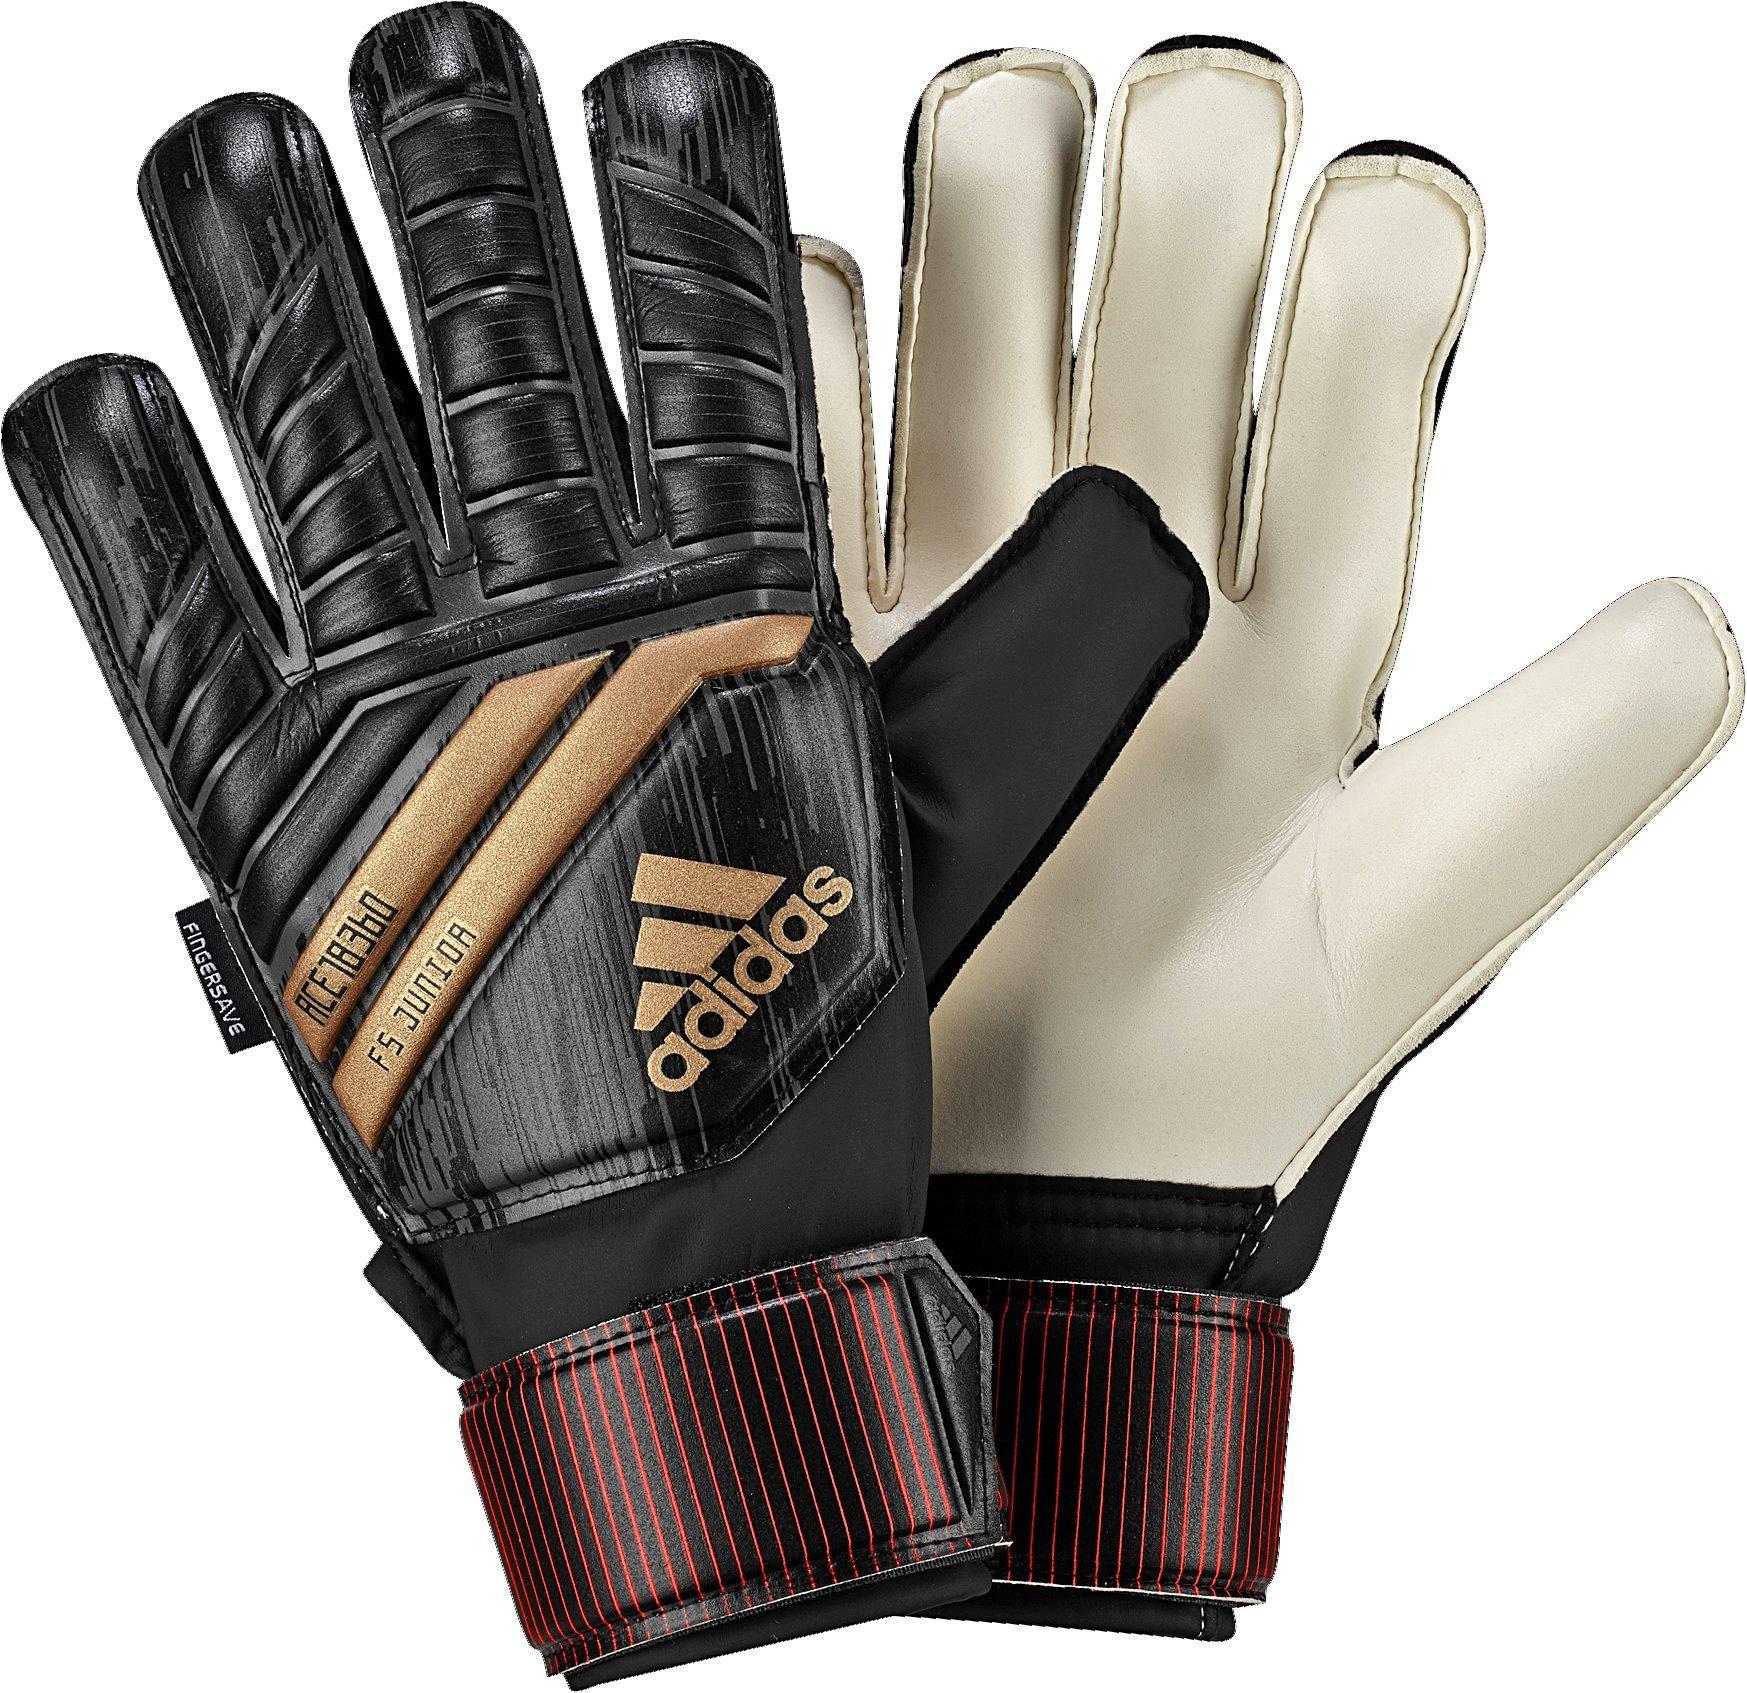 Galleon - Adidas ACE Fingersave Junior Goalie Gloves daa39e4bb290